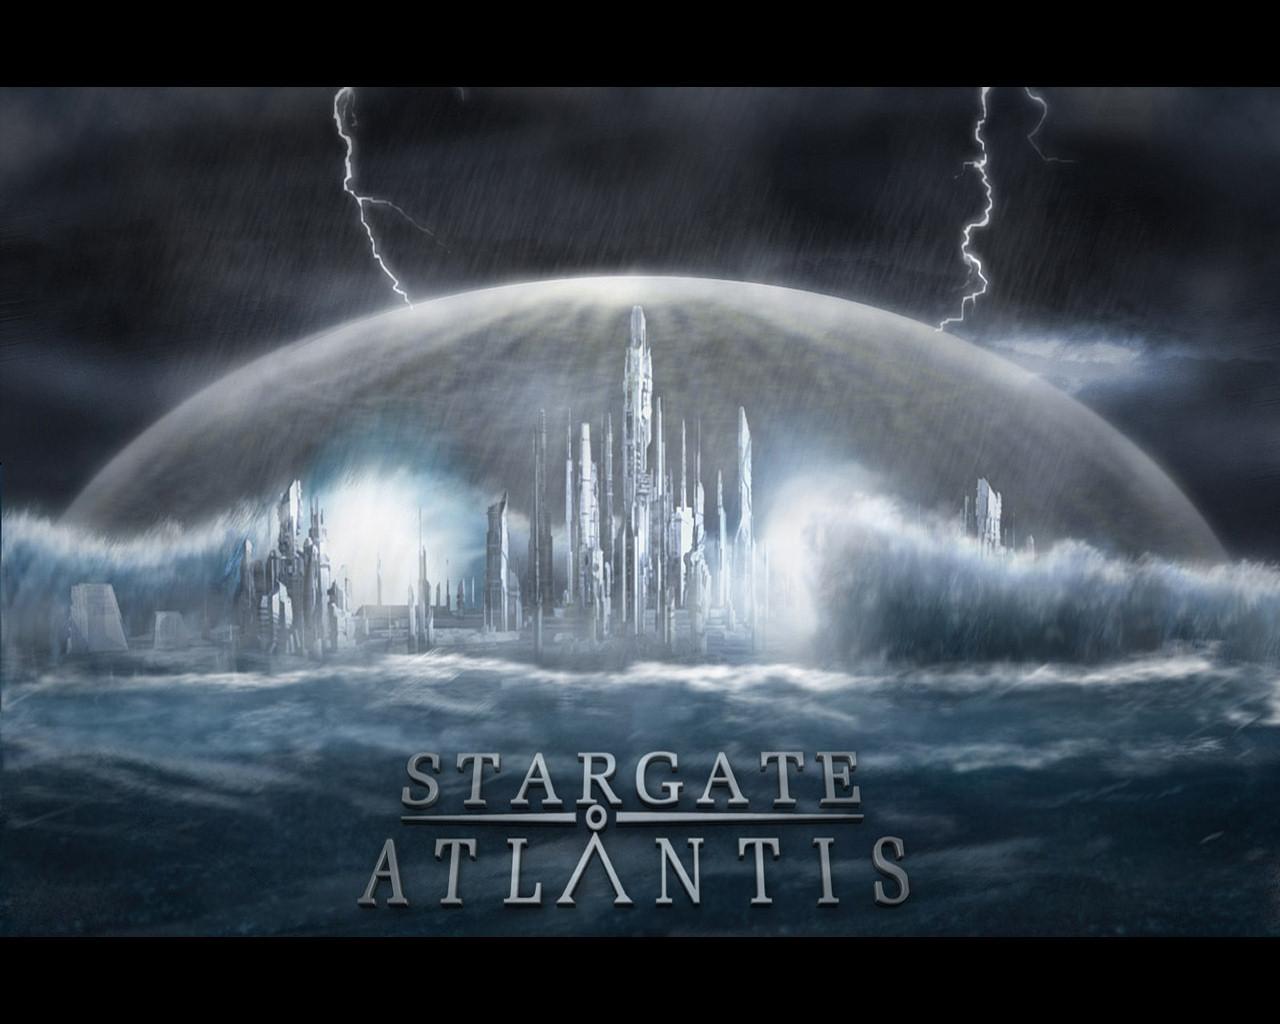 Atlantis in a storm - Stargate: Atlantis 1280x1024